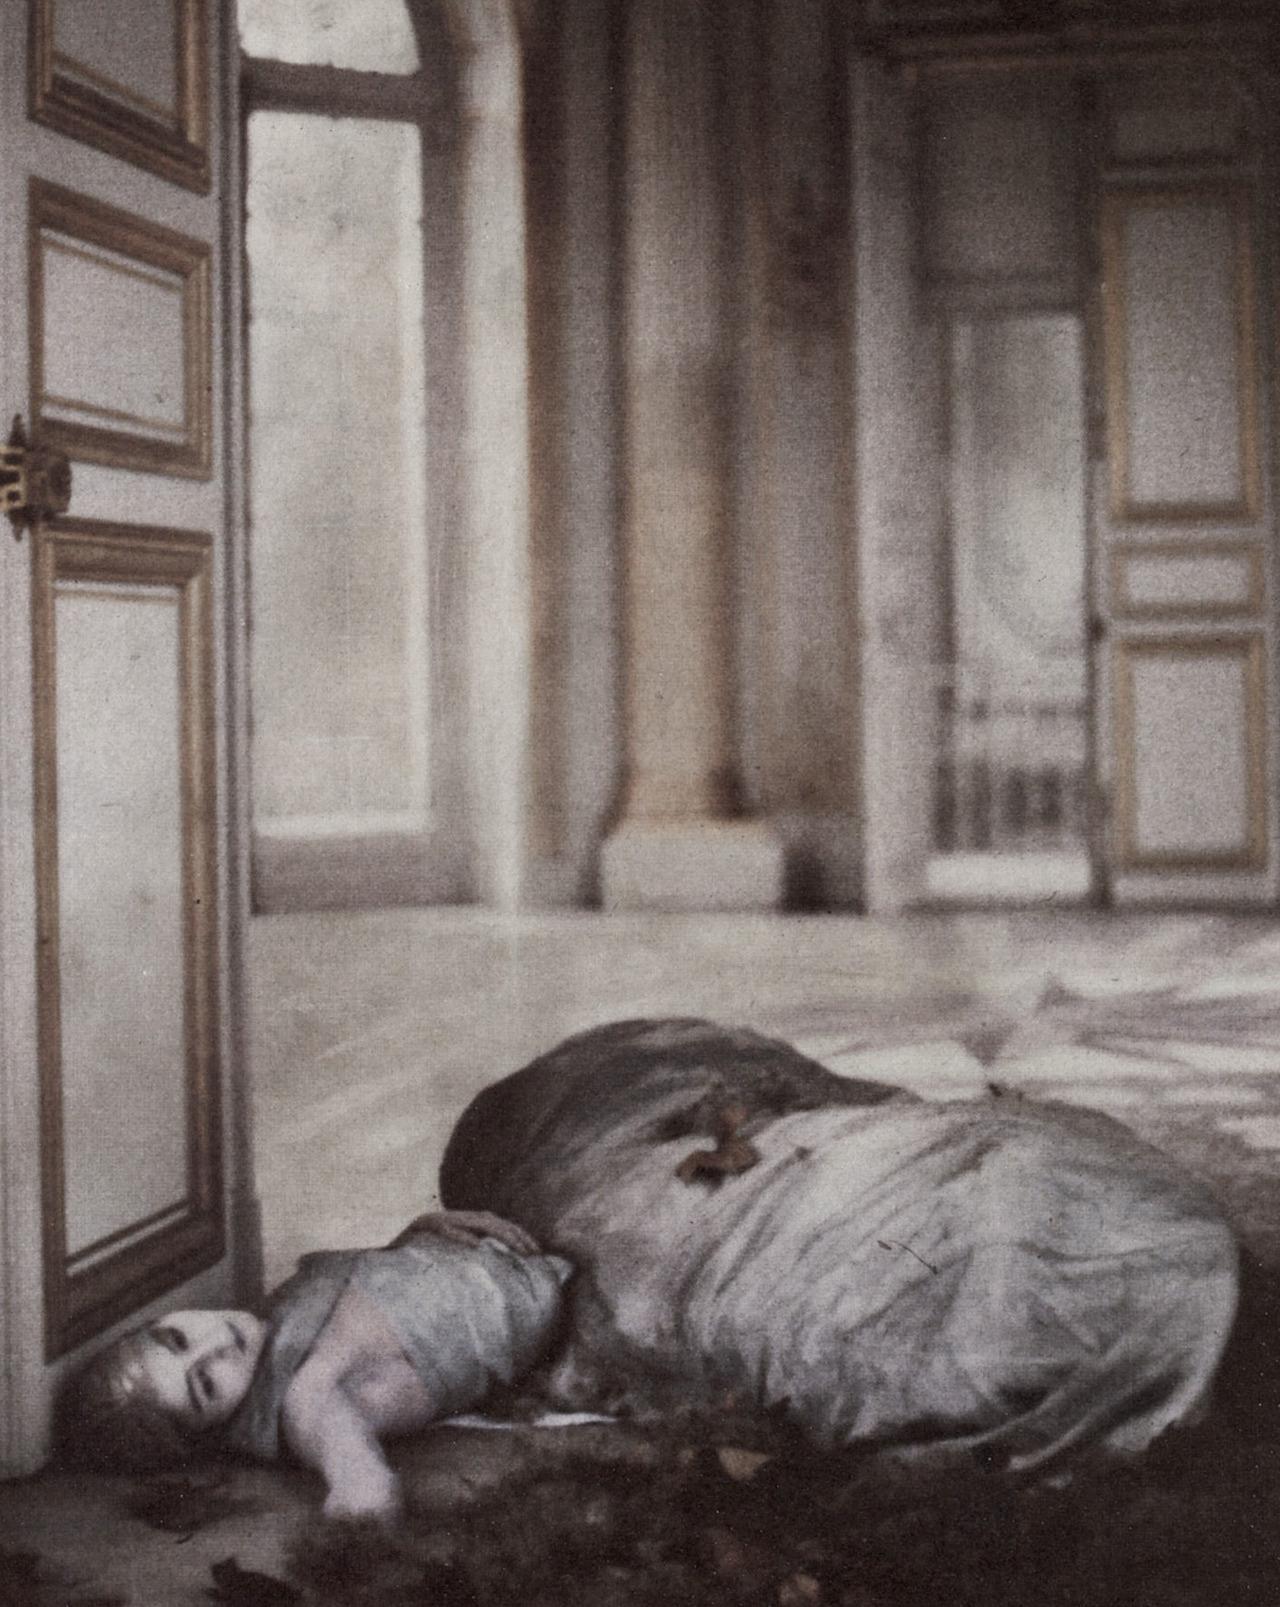 028-deborah-turbeville-theredlist